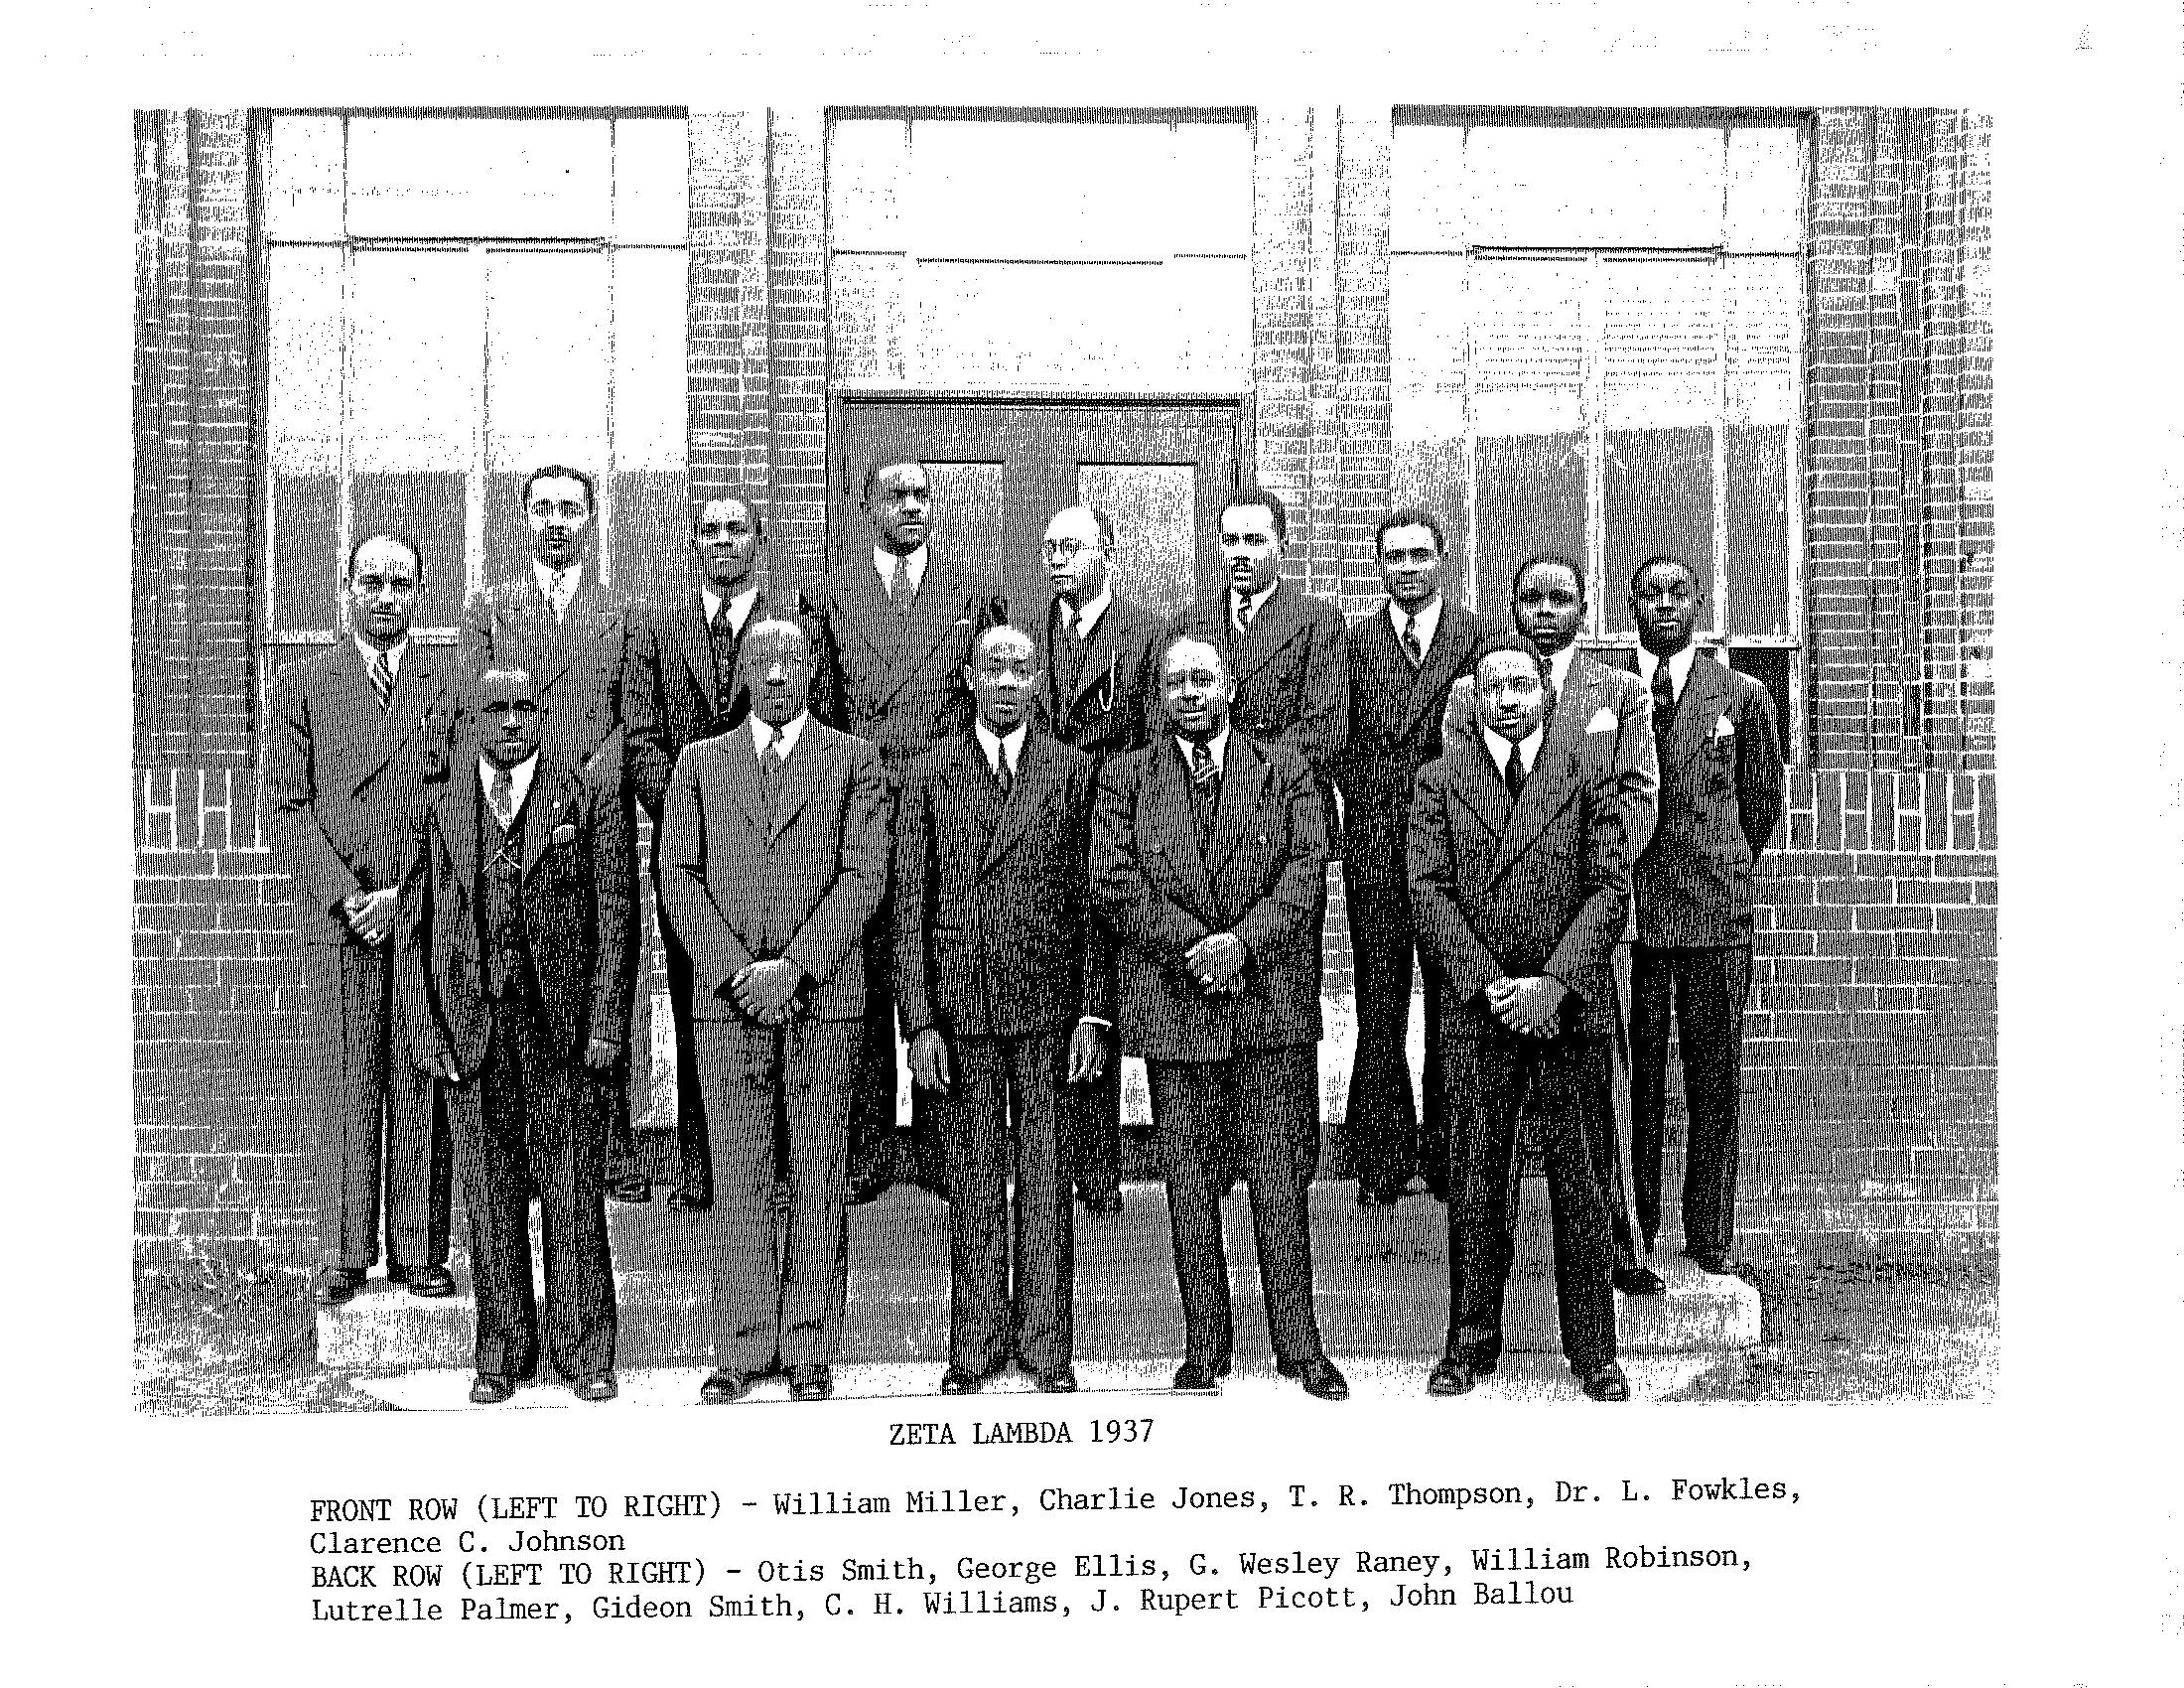 Zeta Lambda 1937.png